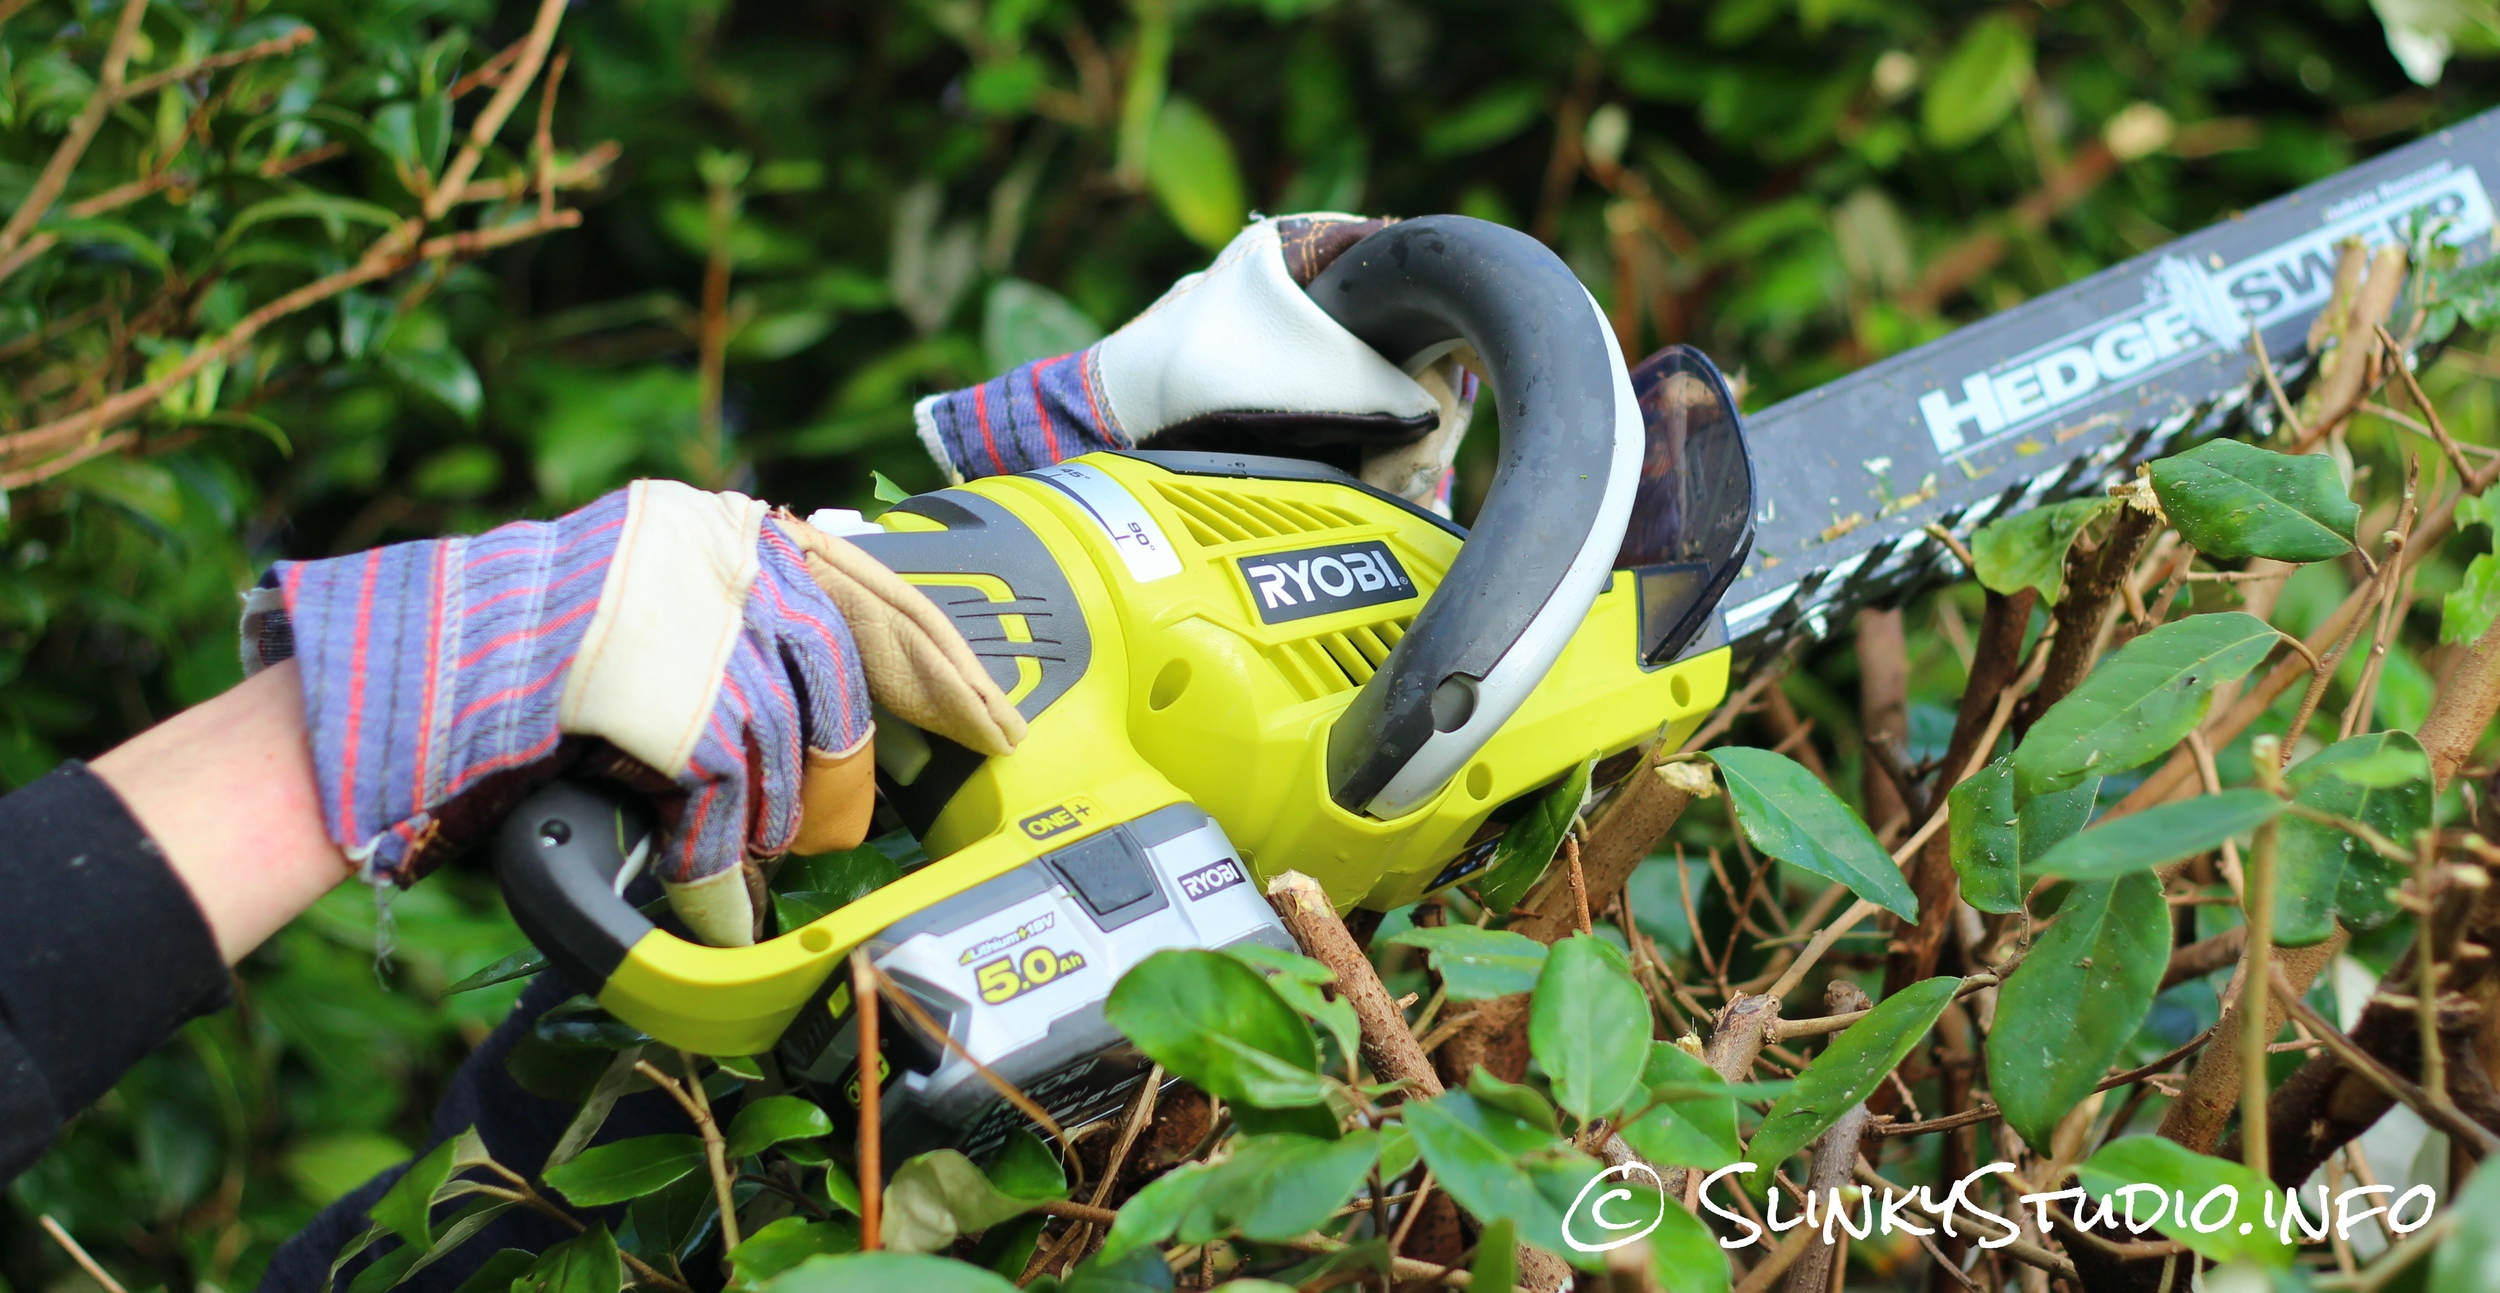 Ryobi 18V ONE+ Hedge Trimmer Review - Slinky Studio